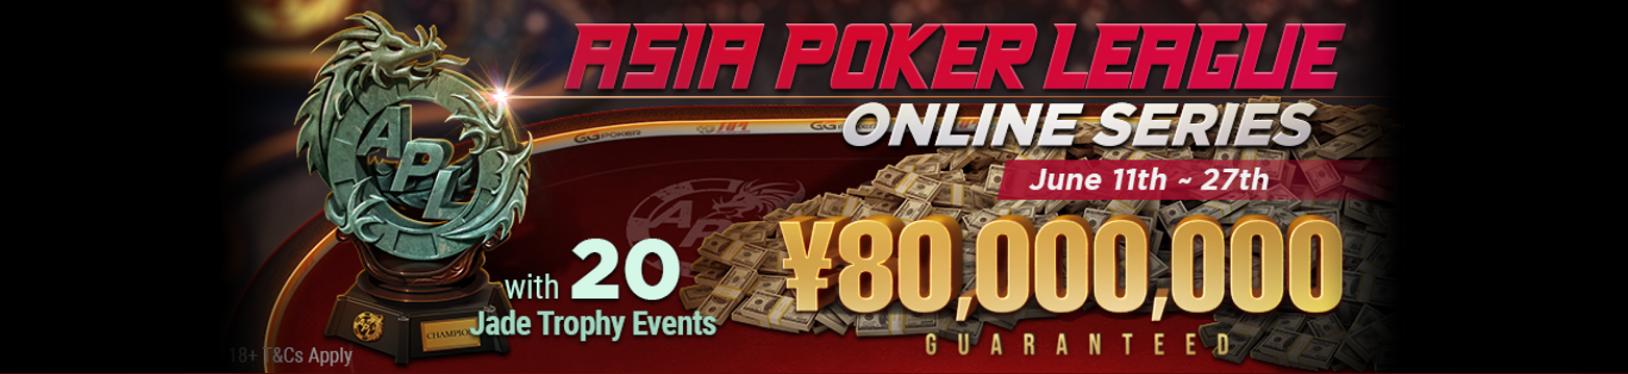 asia poker league